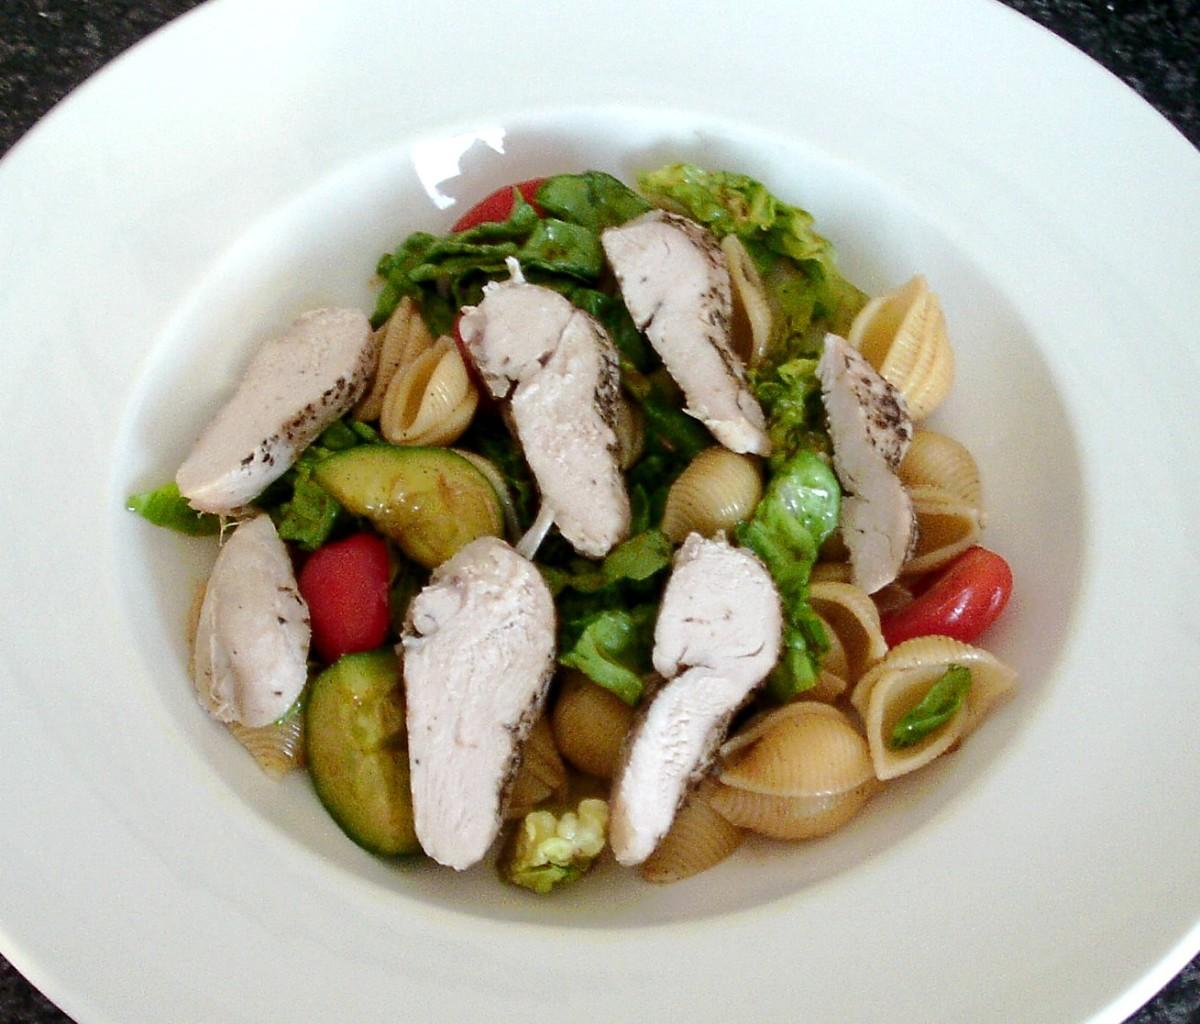 Cold chicken breast strips and conchiglie pasta summer salad